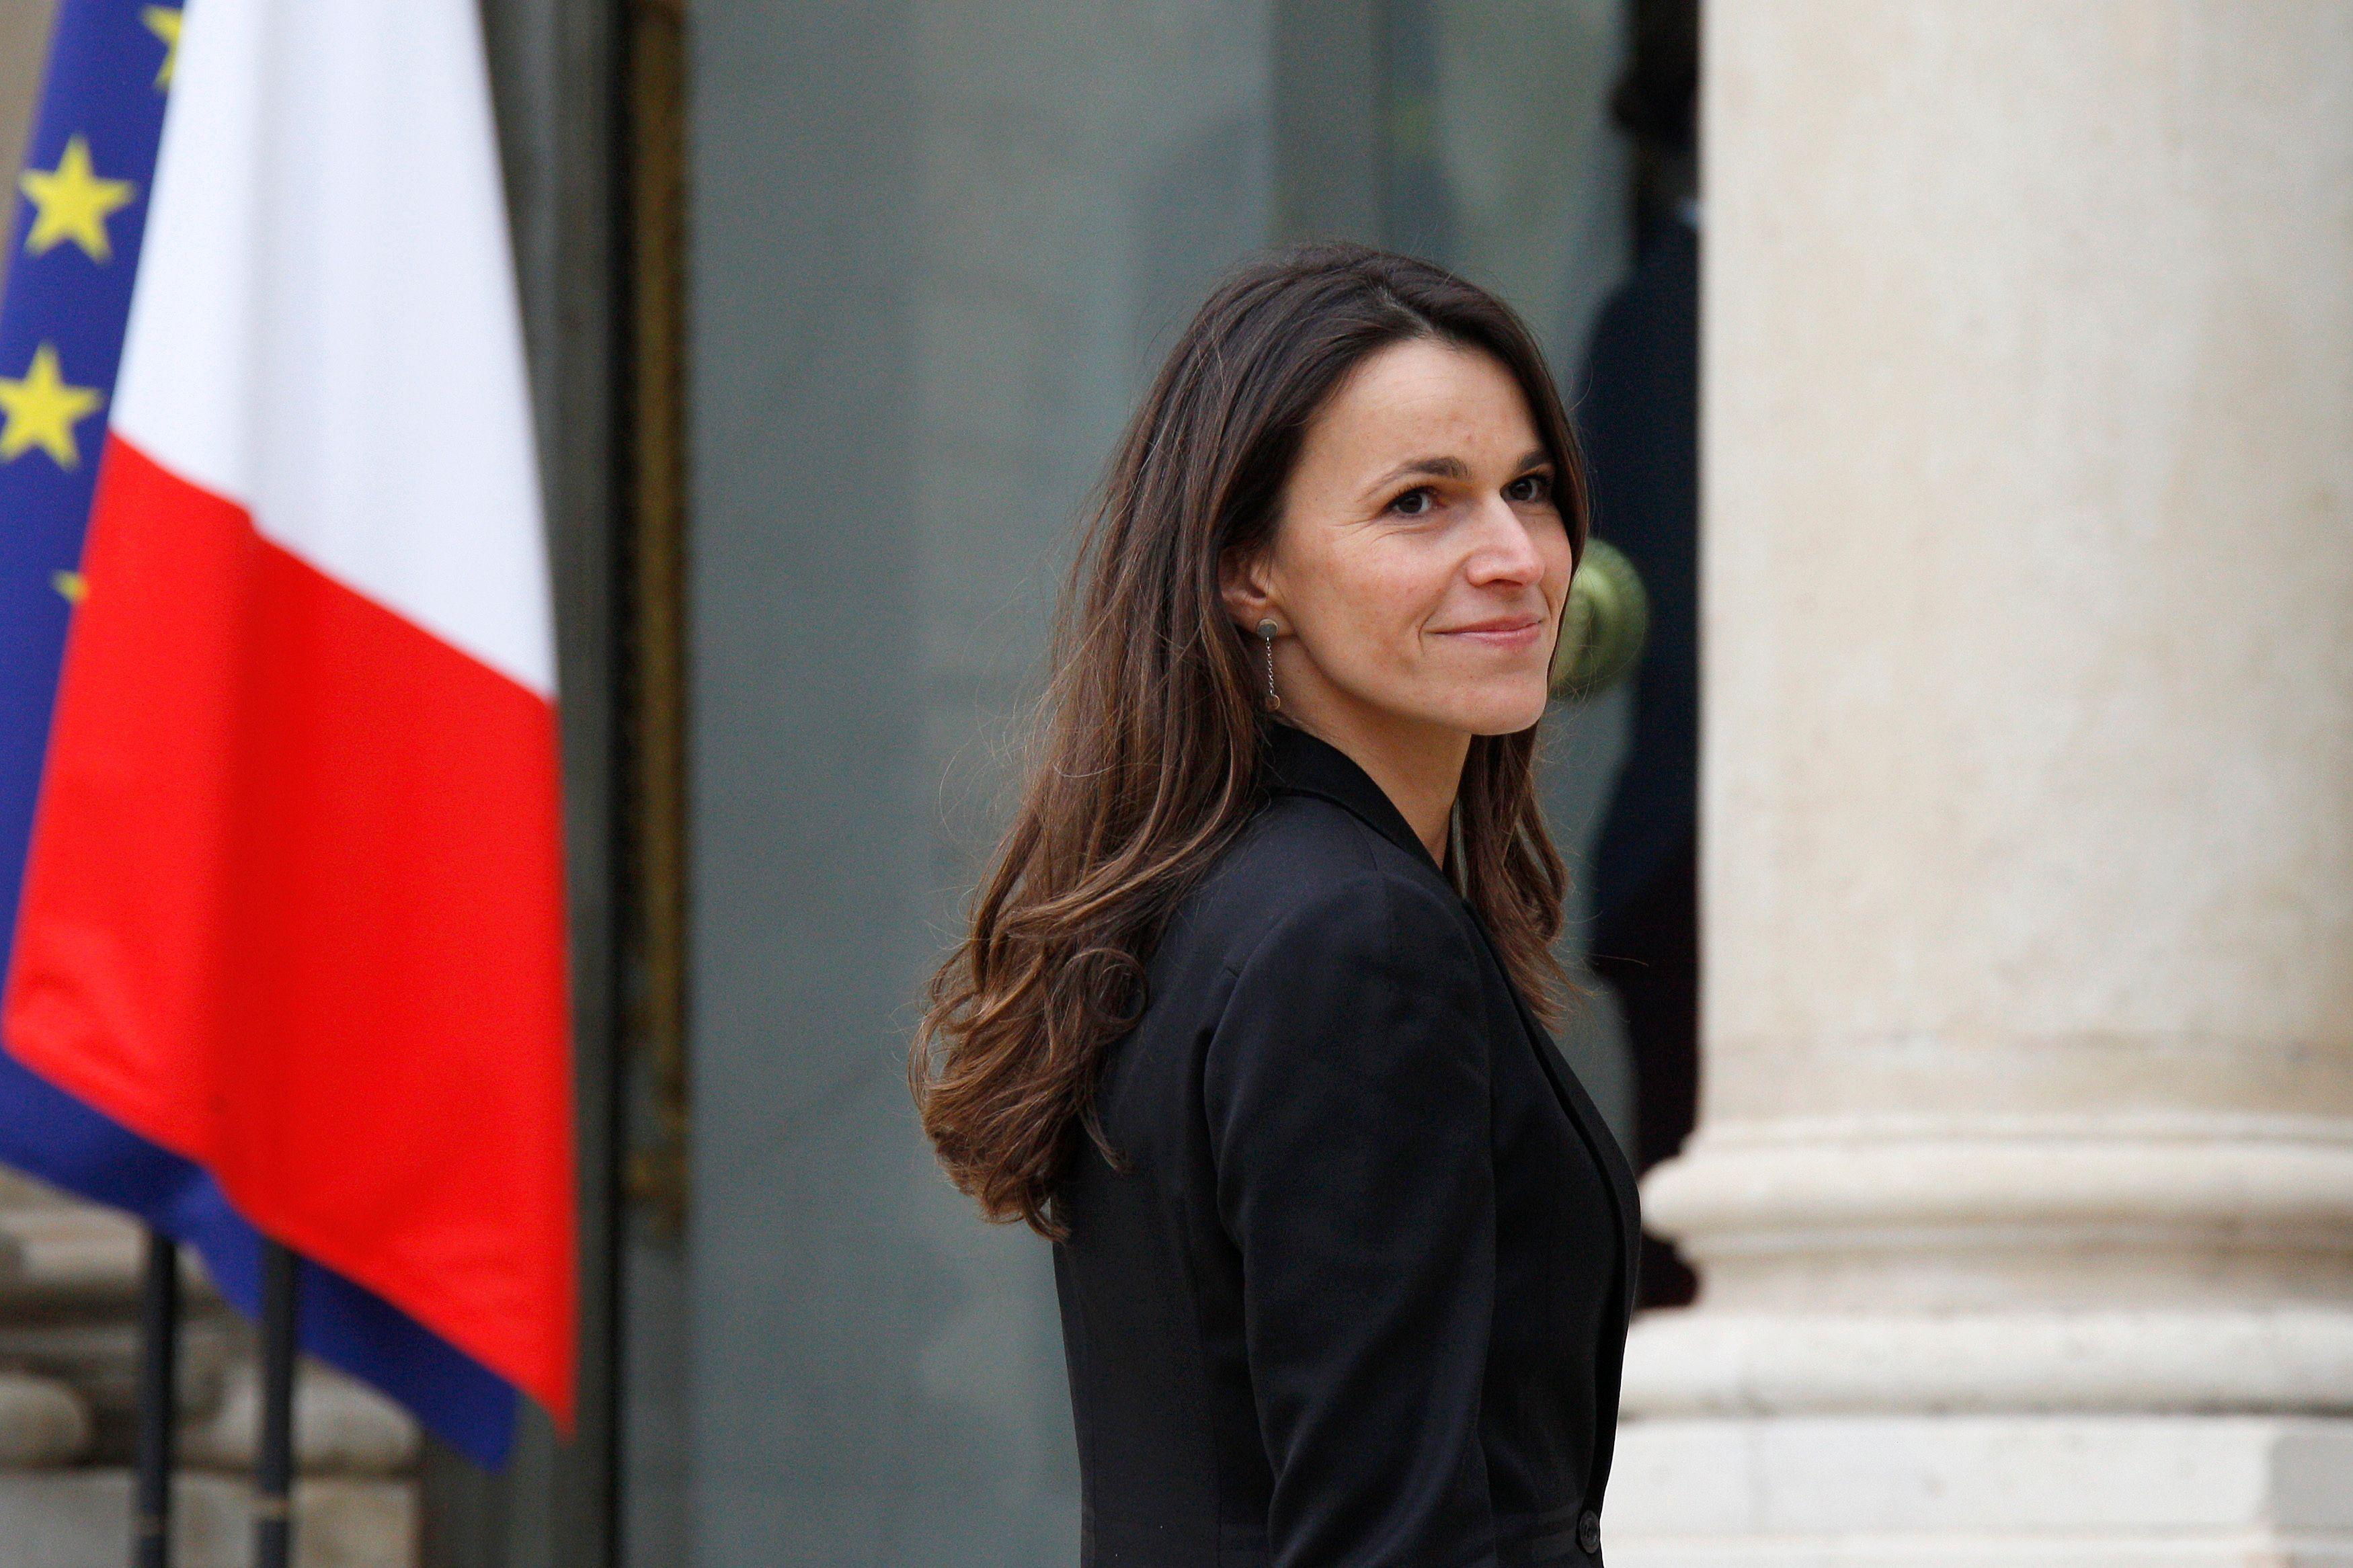 Aurélie Filippetti défend Christiane Taubira